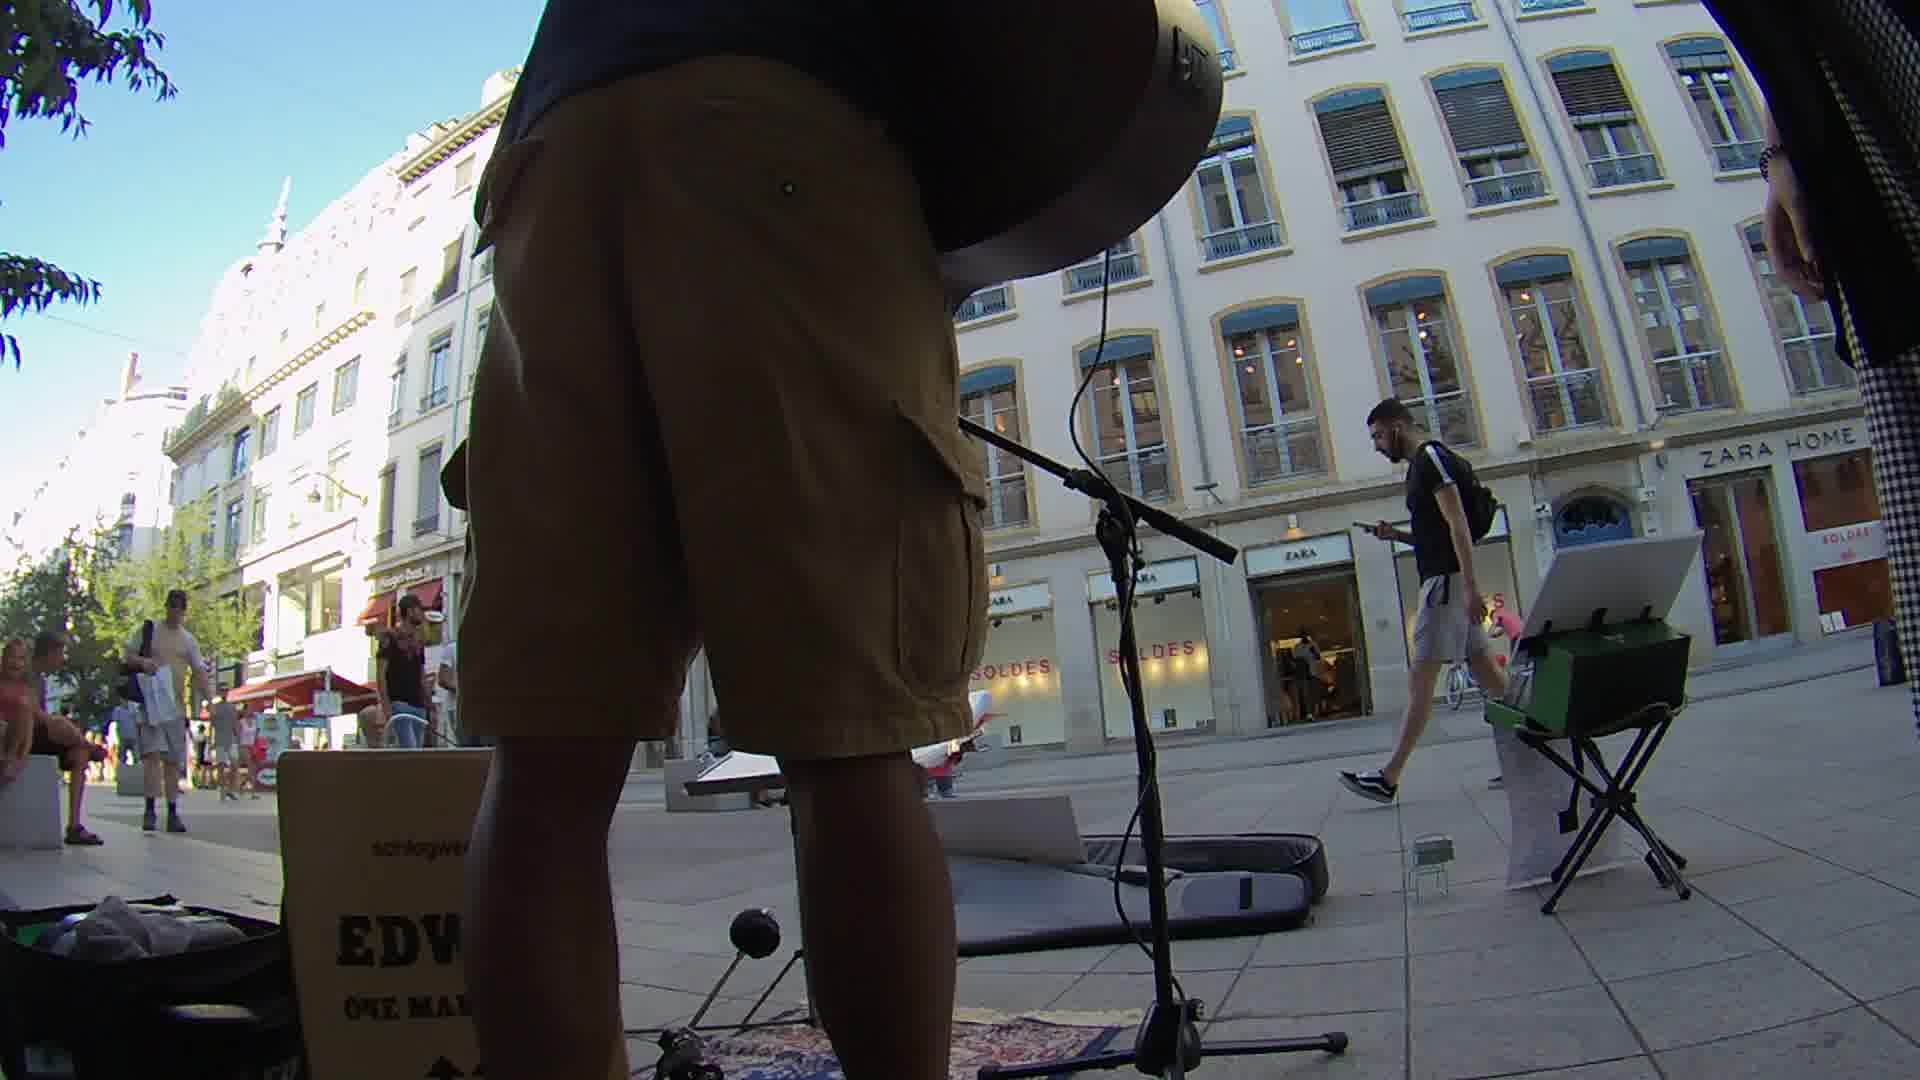 26/07/2018: Jam Session in Lyon